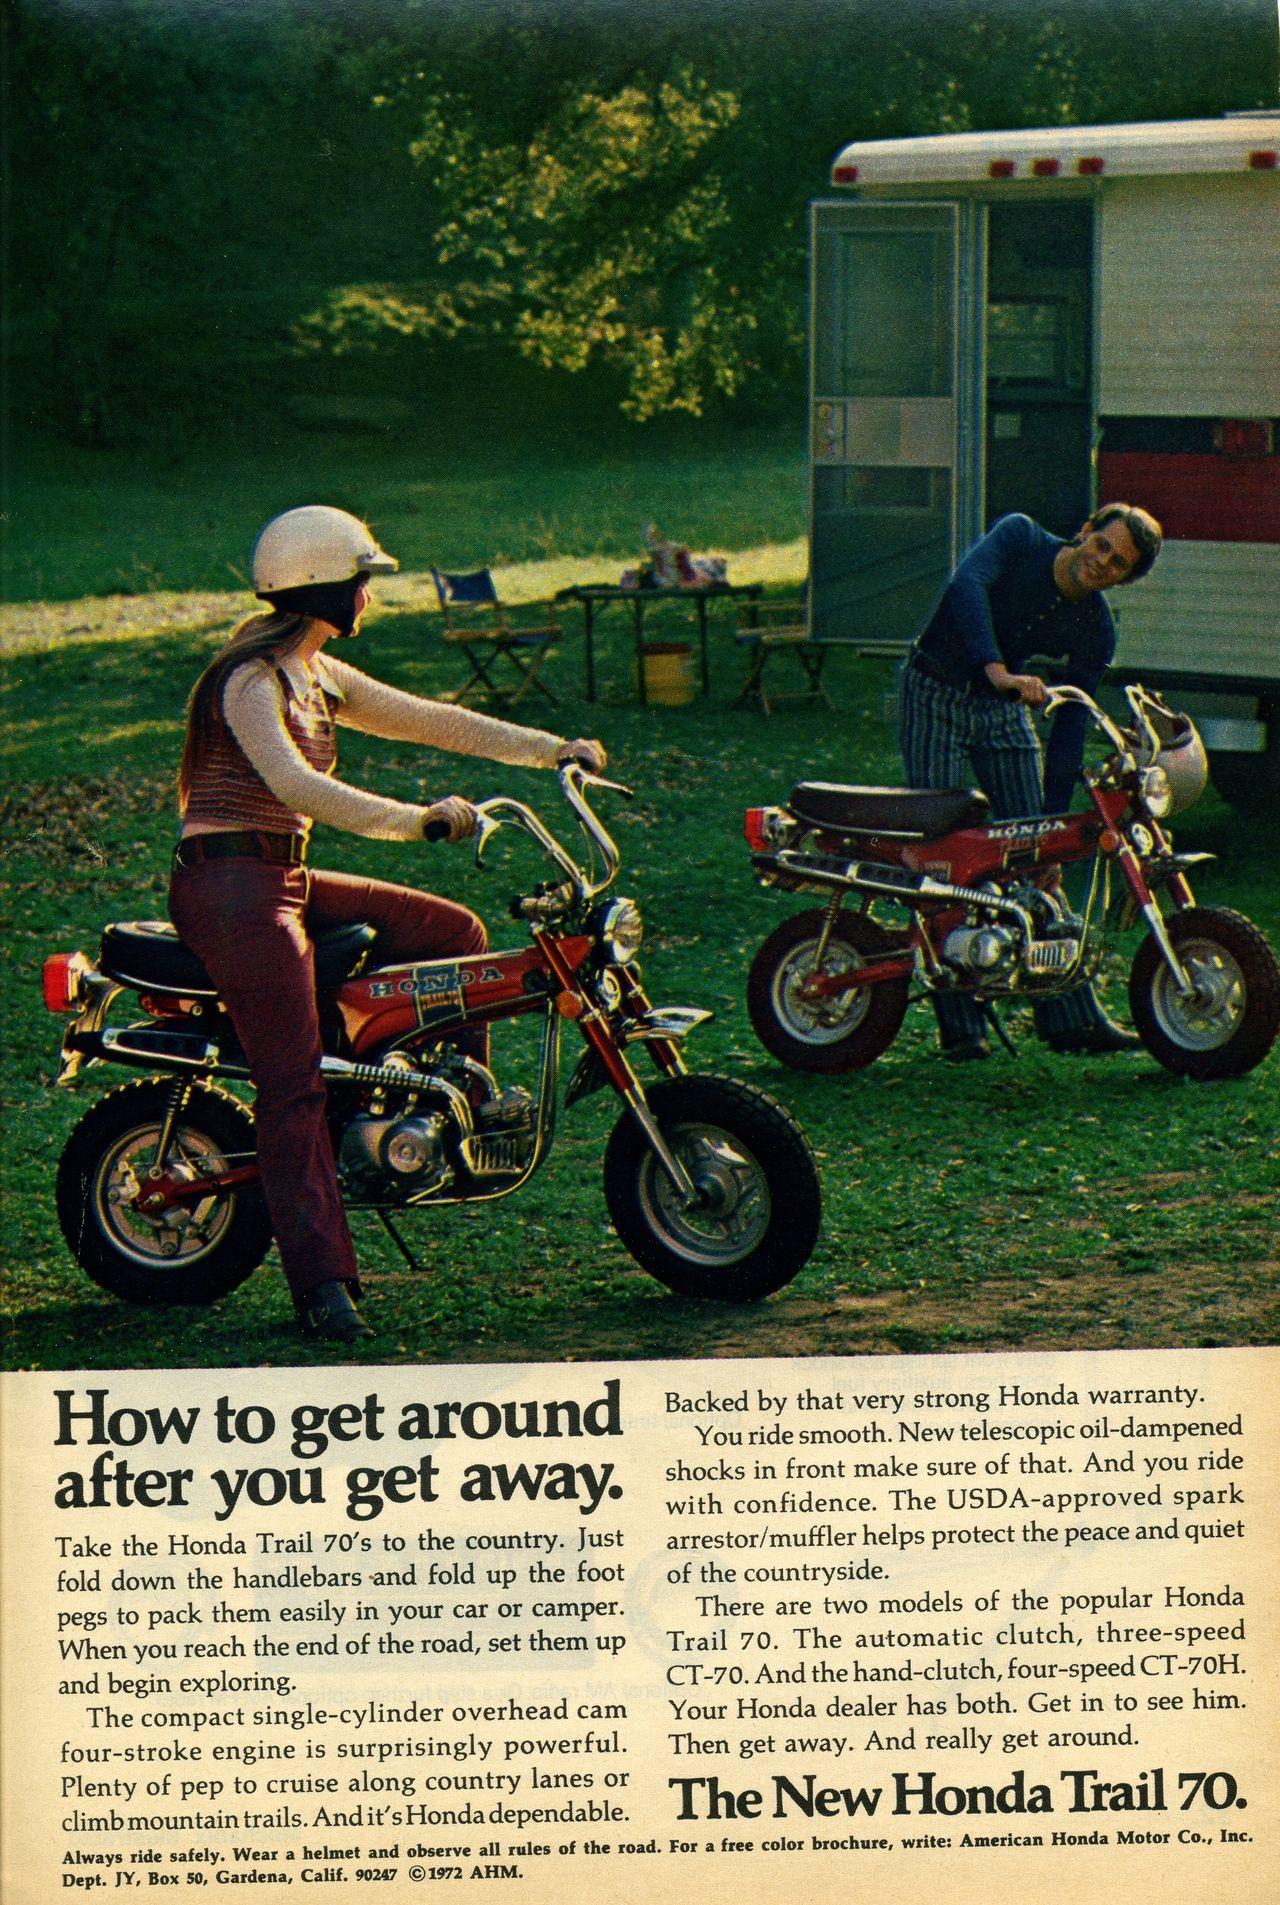 1972 honda trail 70 advertisement photo picture [ 1280 x 1905 Pixel ]